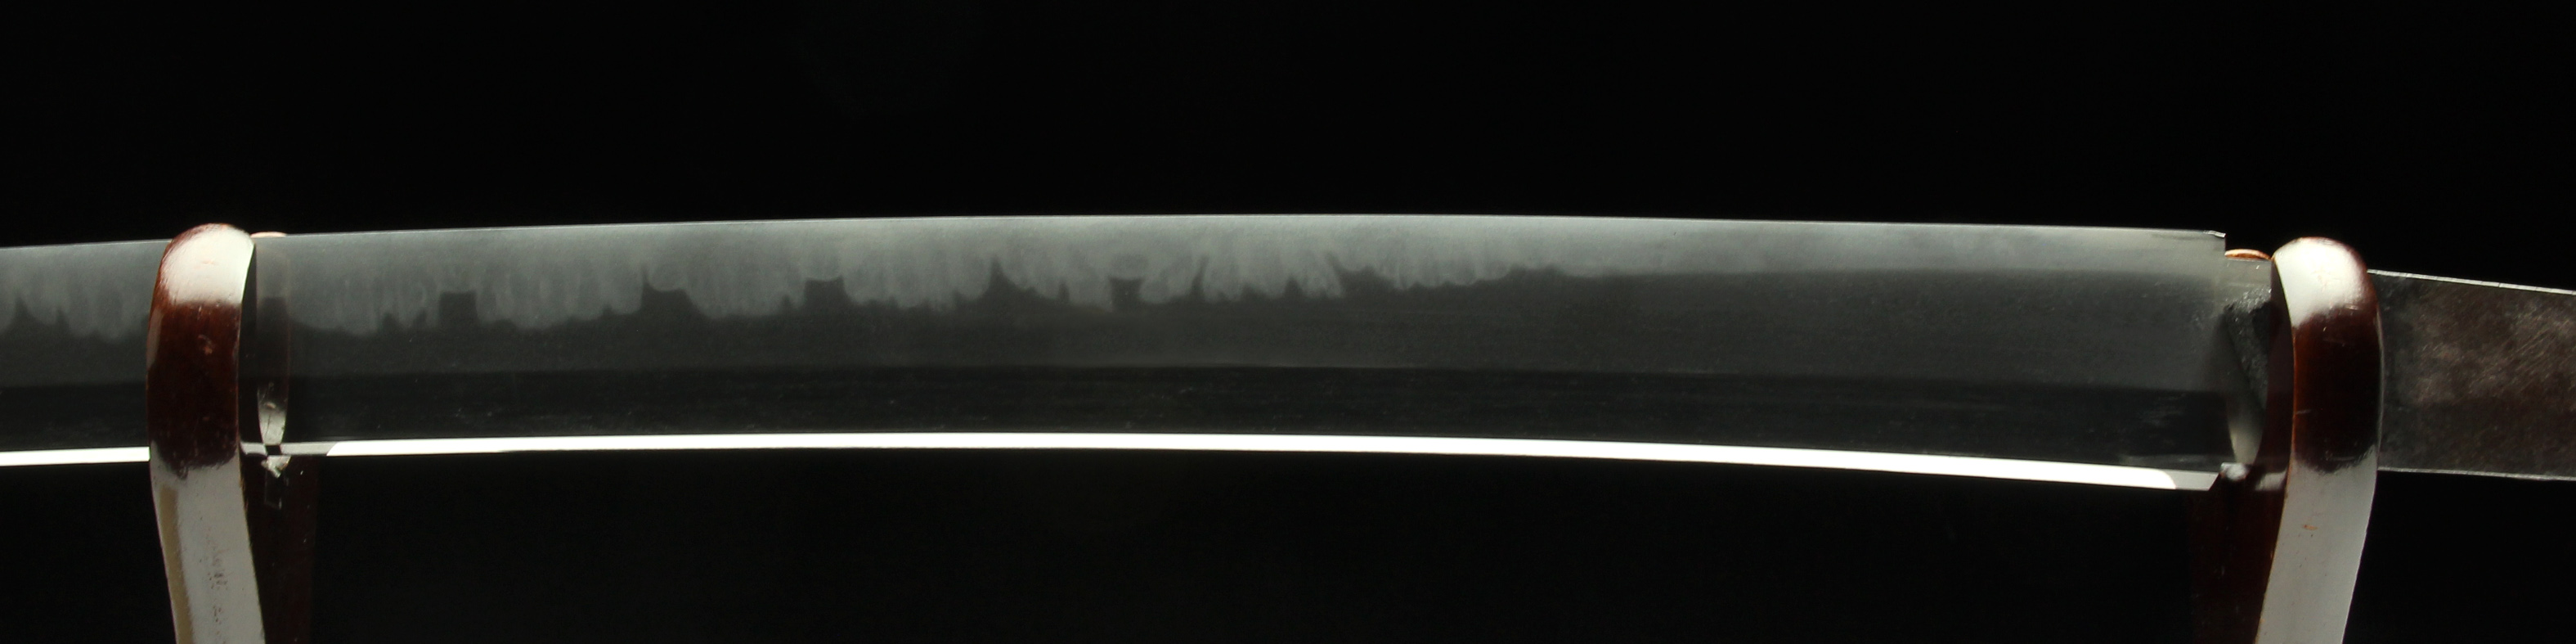 01-2039